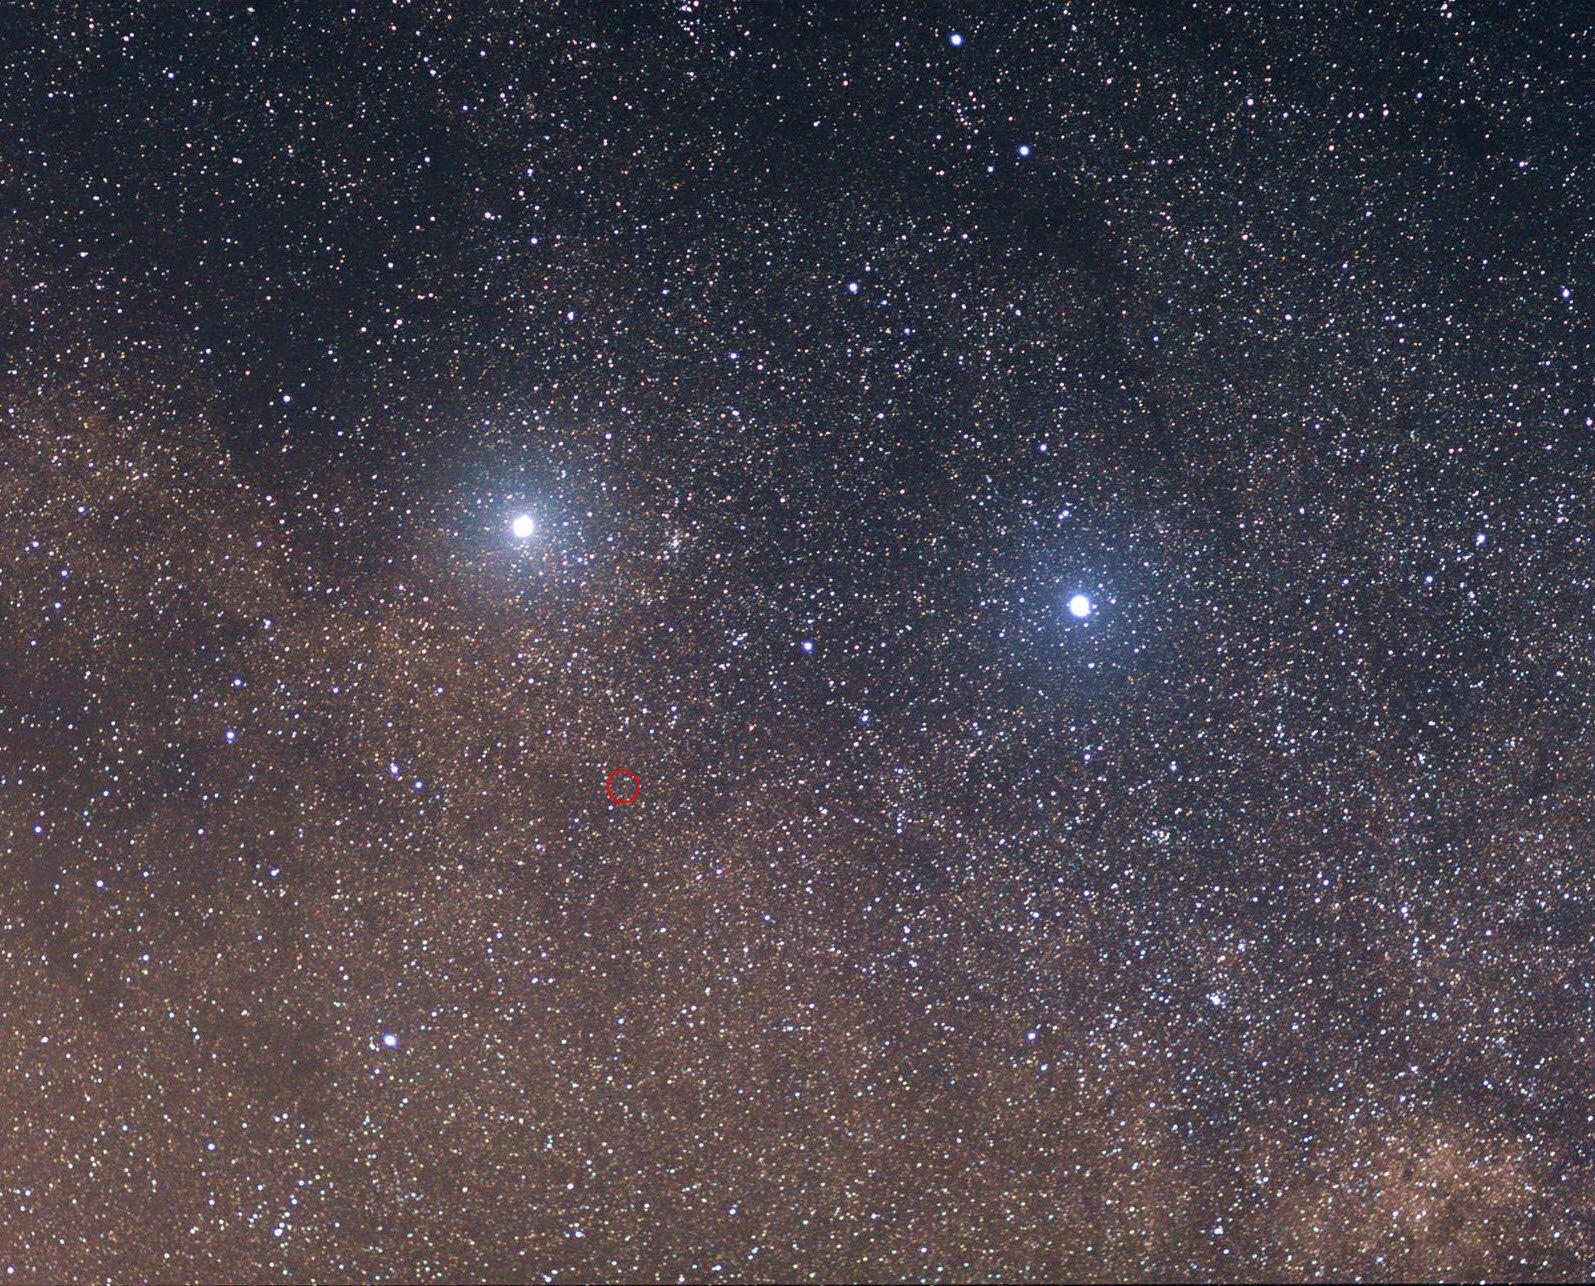 An Earth-like stellar wind for Proxima Centauri c